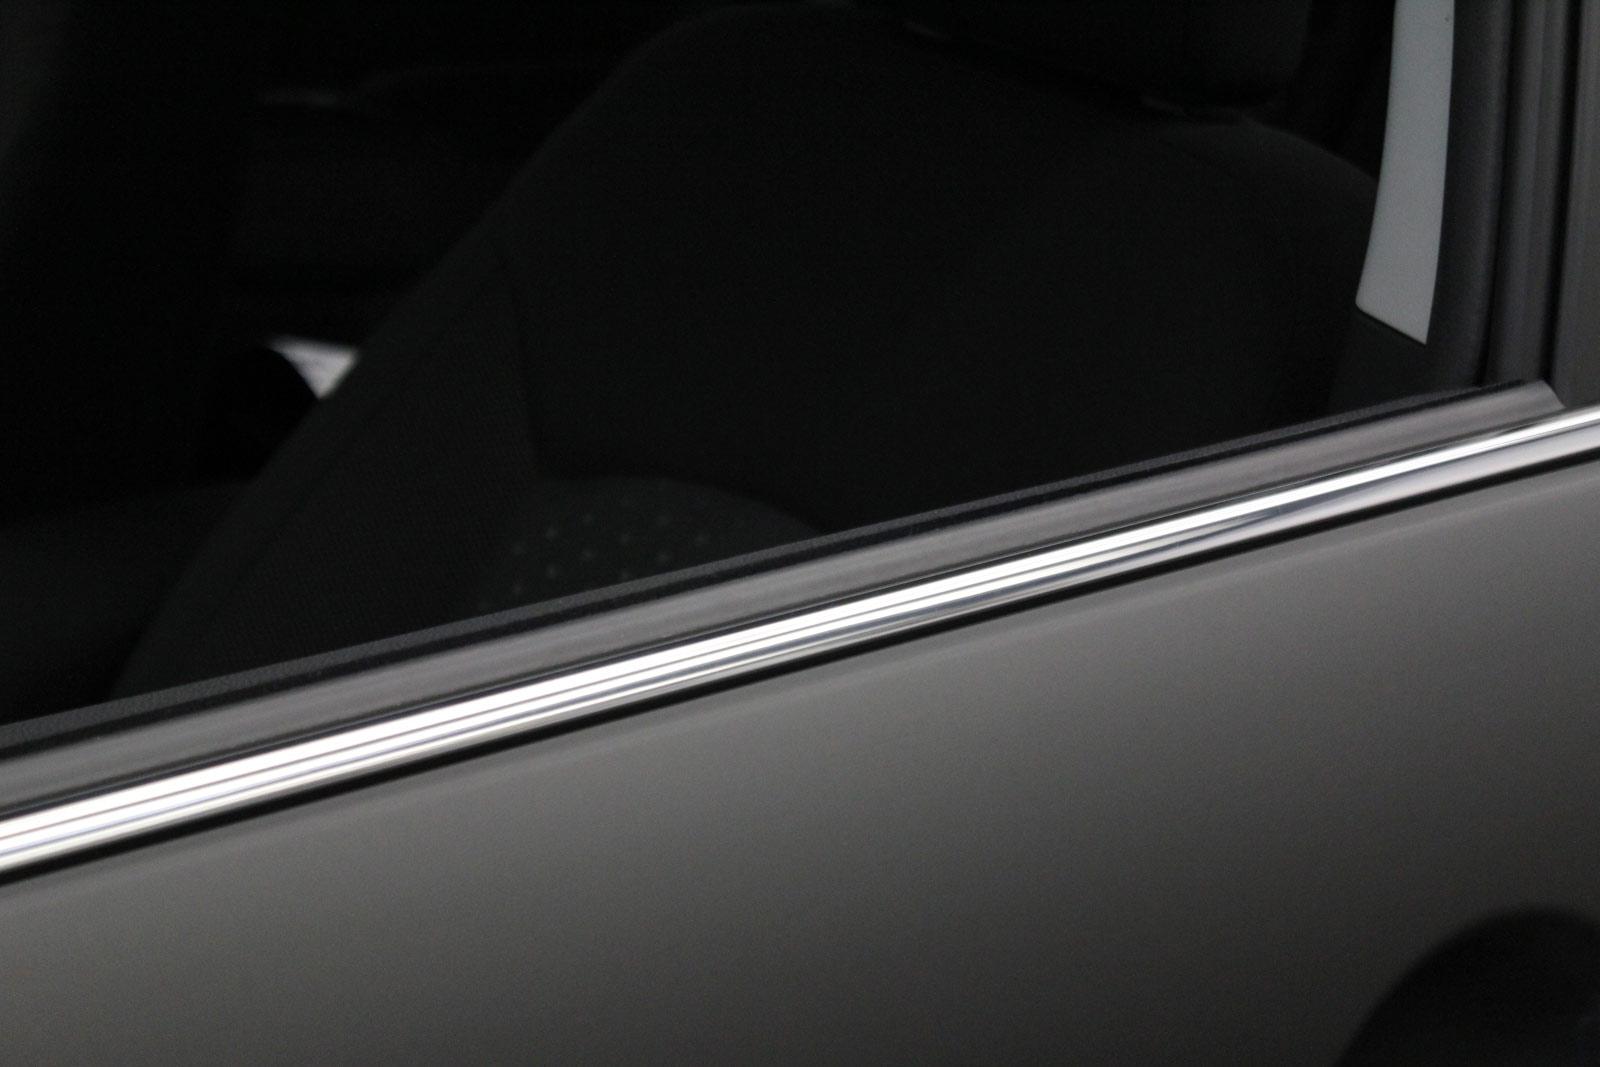 Mitsubishi_ASX_Folierung_Schwarz_Matt_03